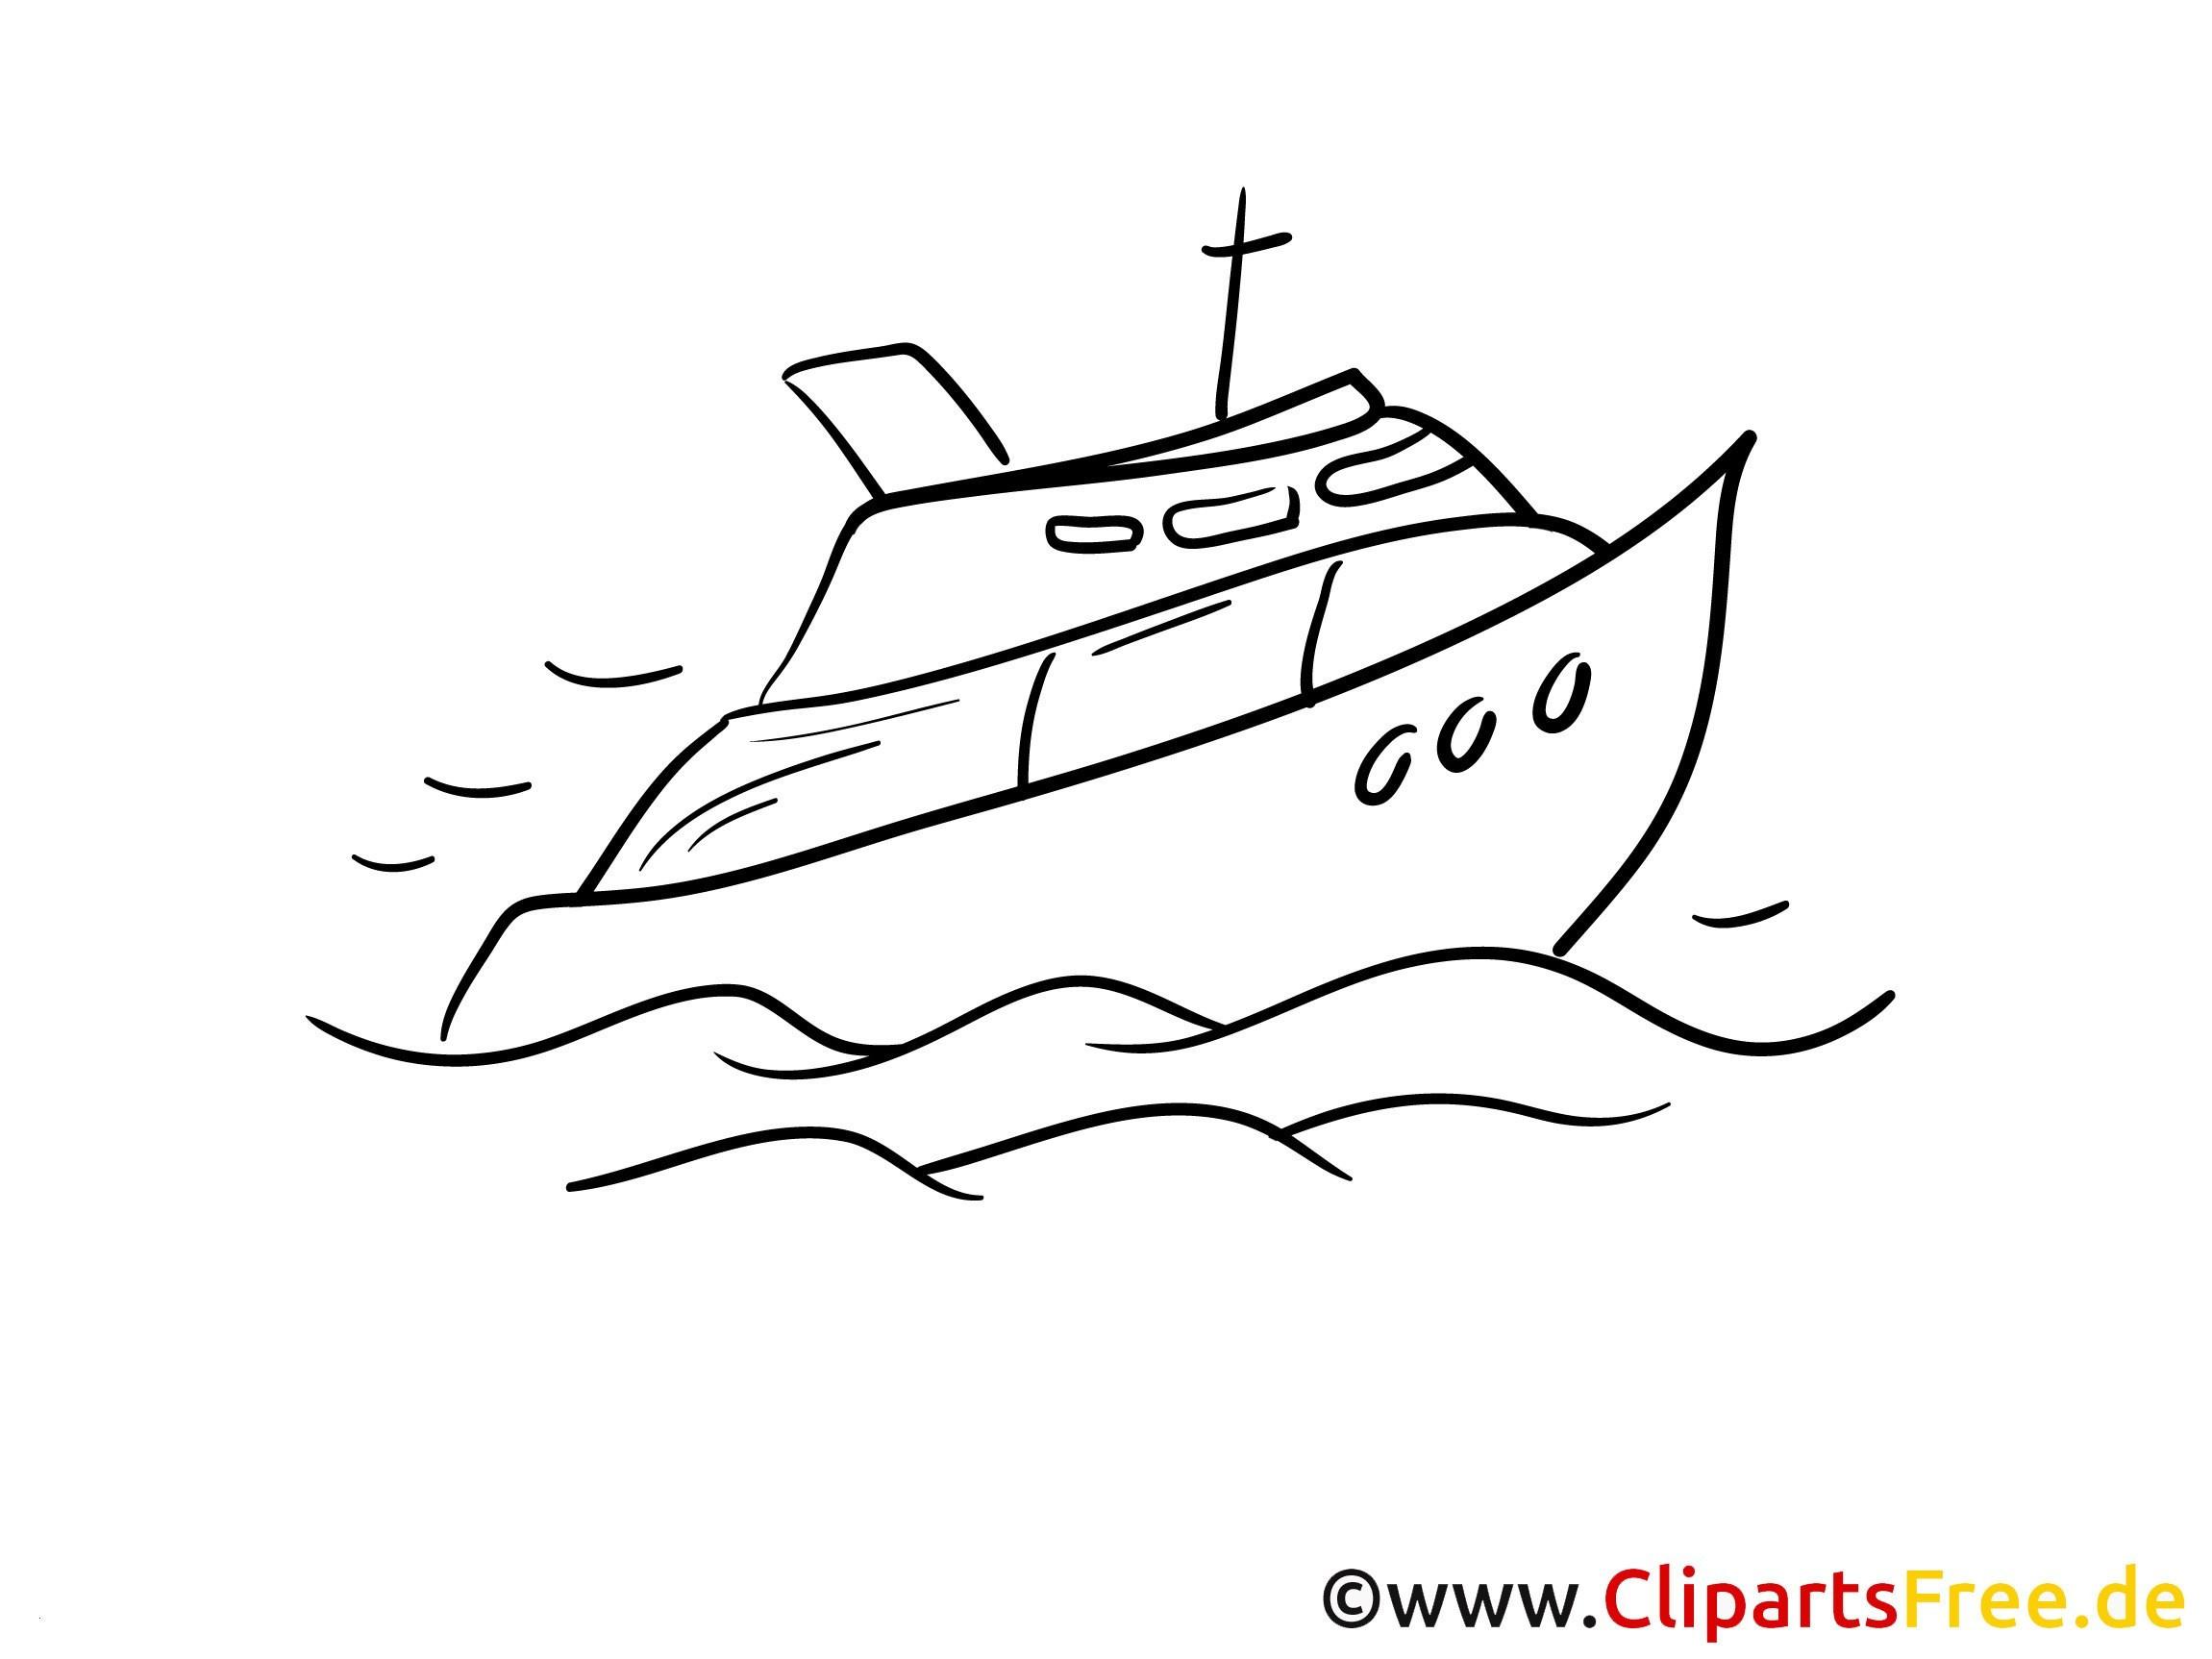 U Boot Ausmalbild Inspirierend Boot Malvorlagen atemberaubende 35 Ausmalbilder Boot Scoredatscore Bild